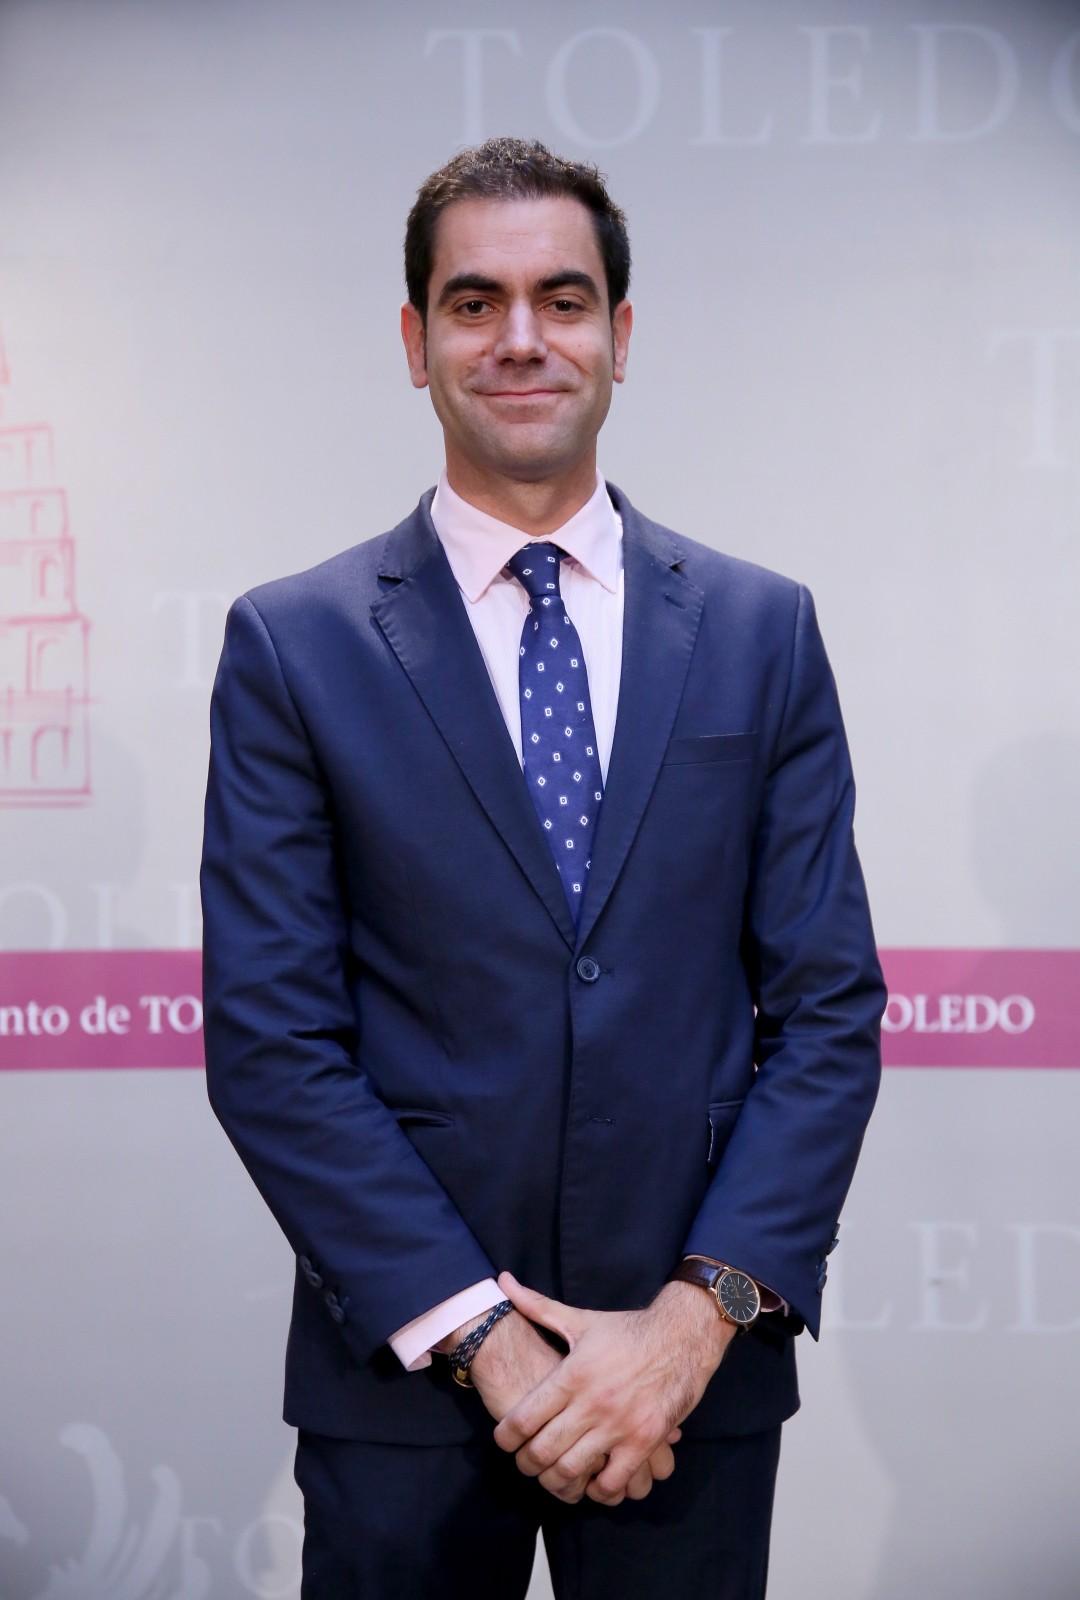 Julio Comendador Arquero